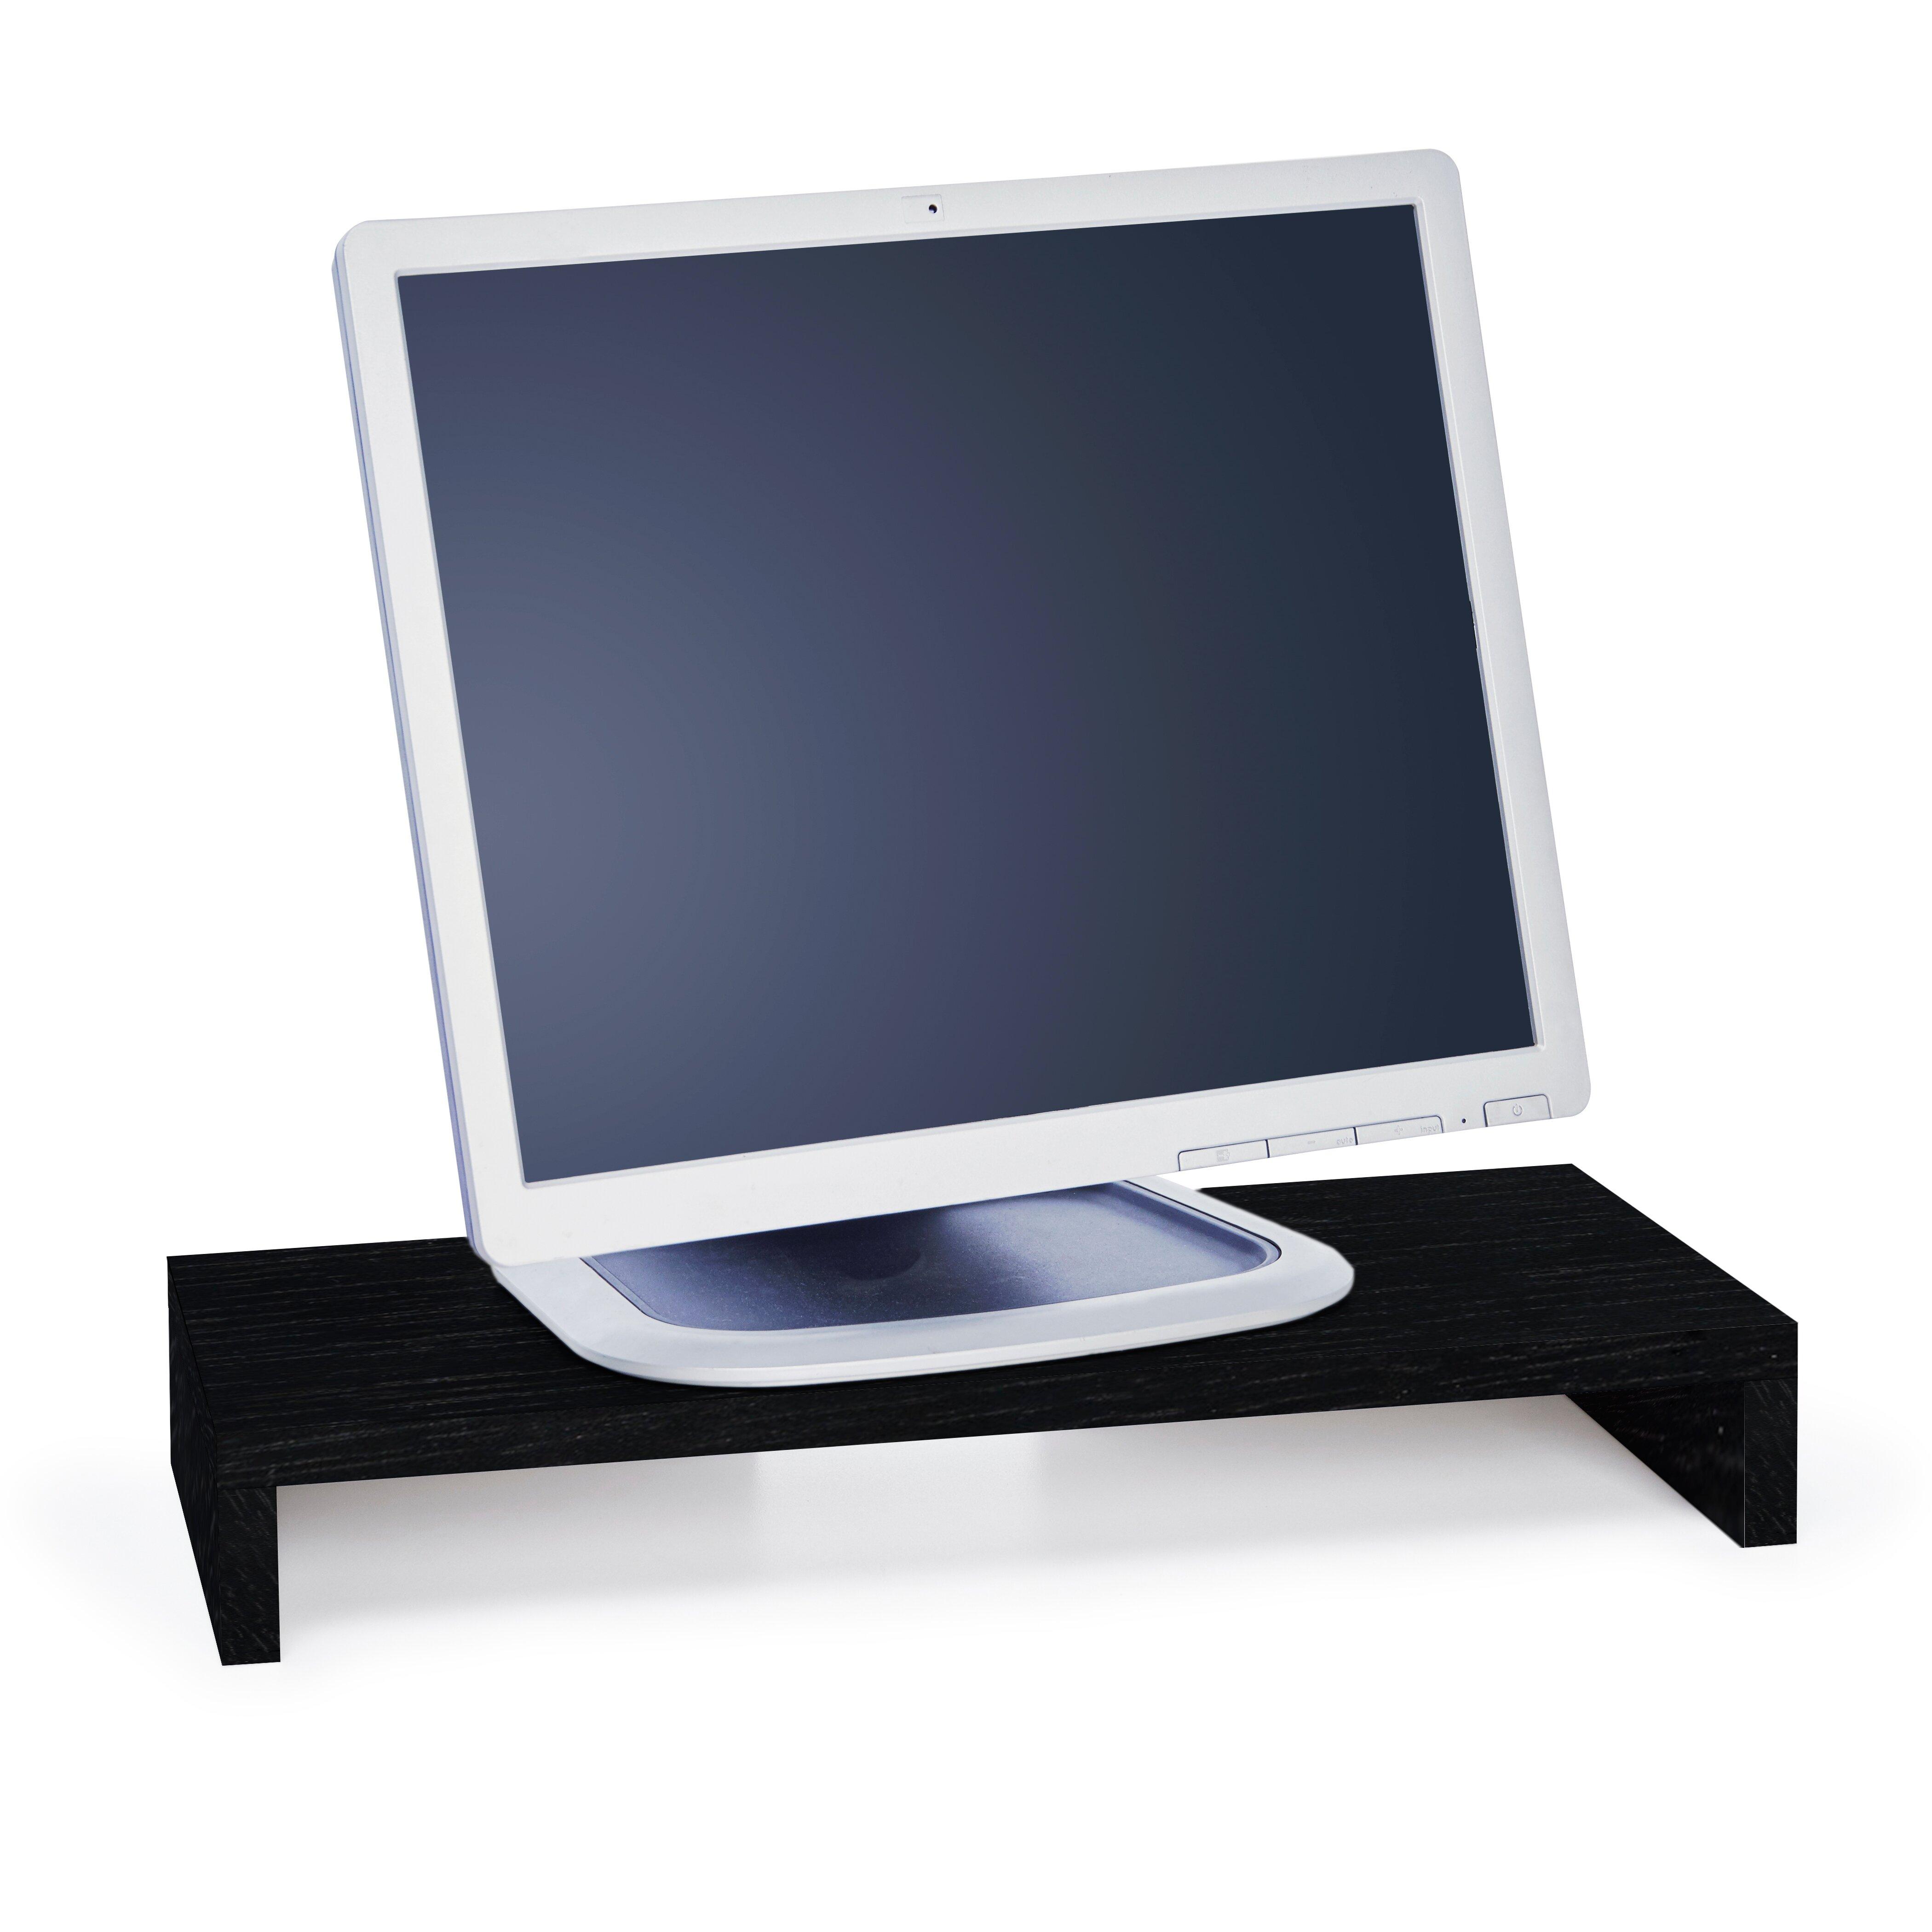 Way Basics Zboard Monitor Desk Mount Amp Reviews Wayfair